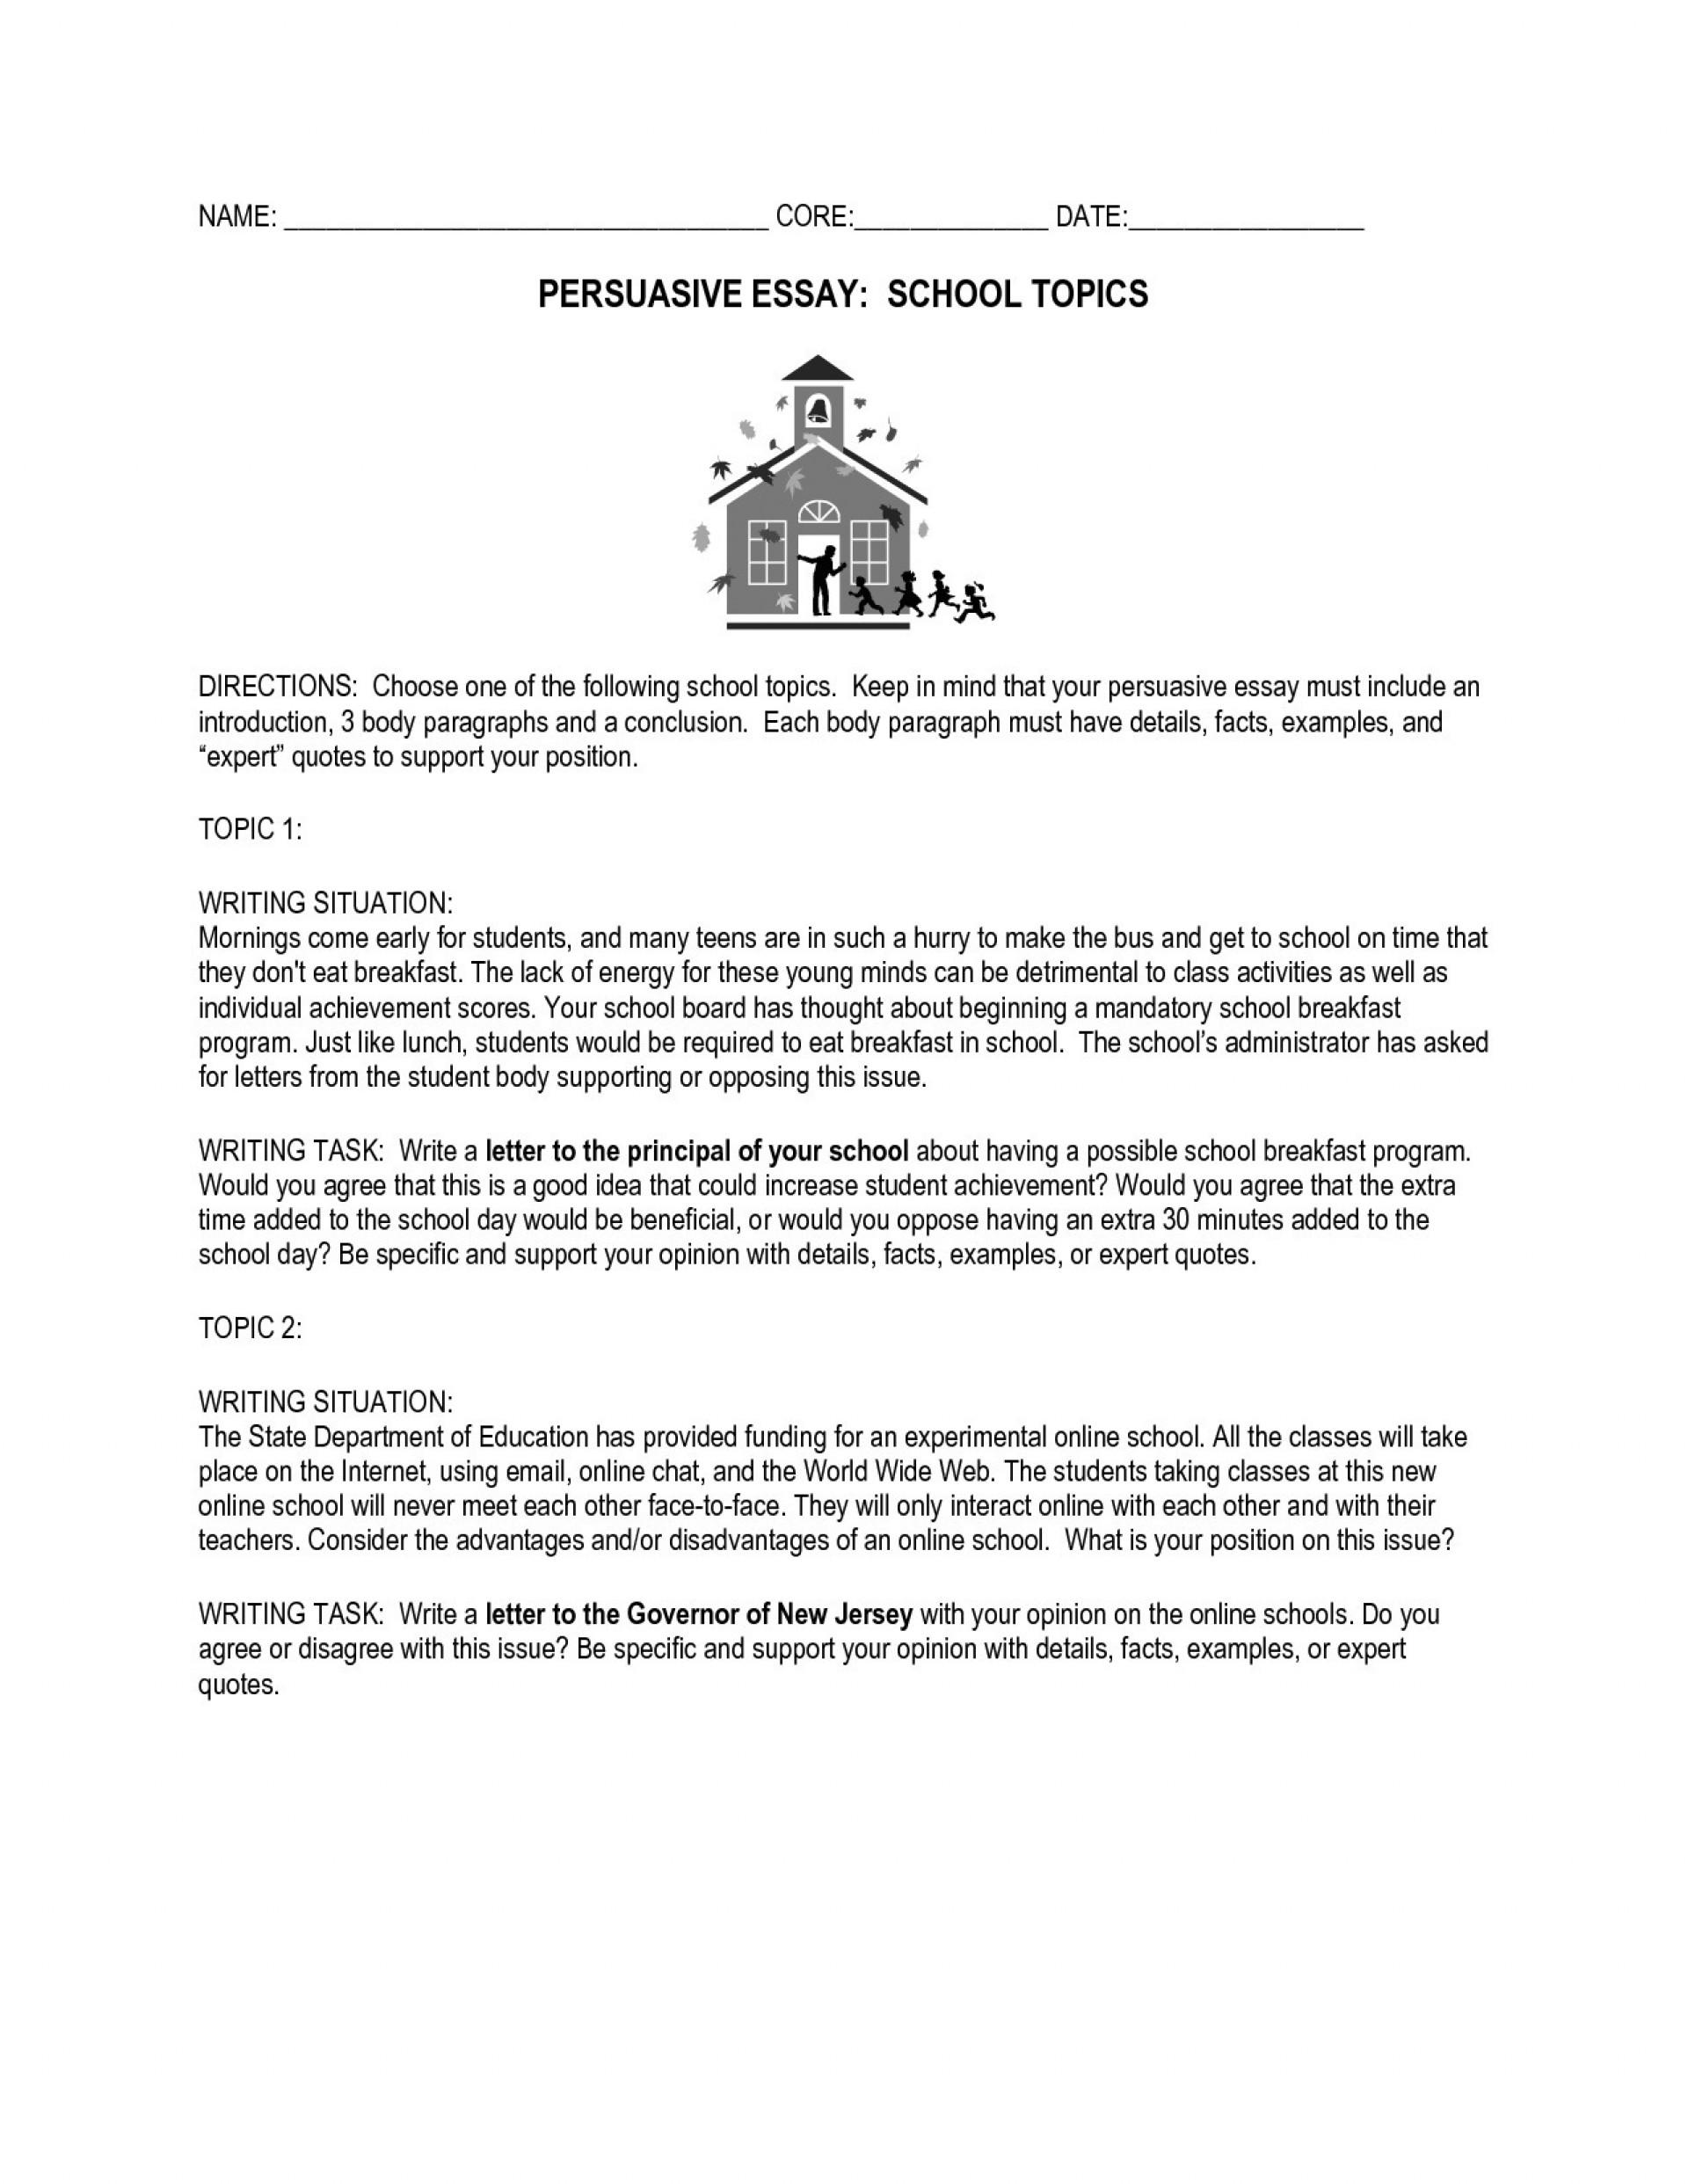 best argumentative essay topics for high school  applydocoumentco  persuasive essay topics middle school example argumentative